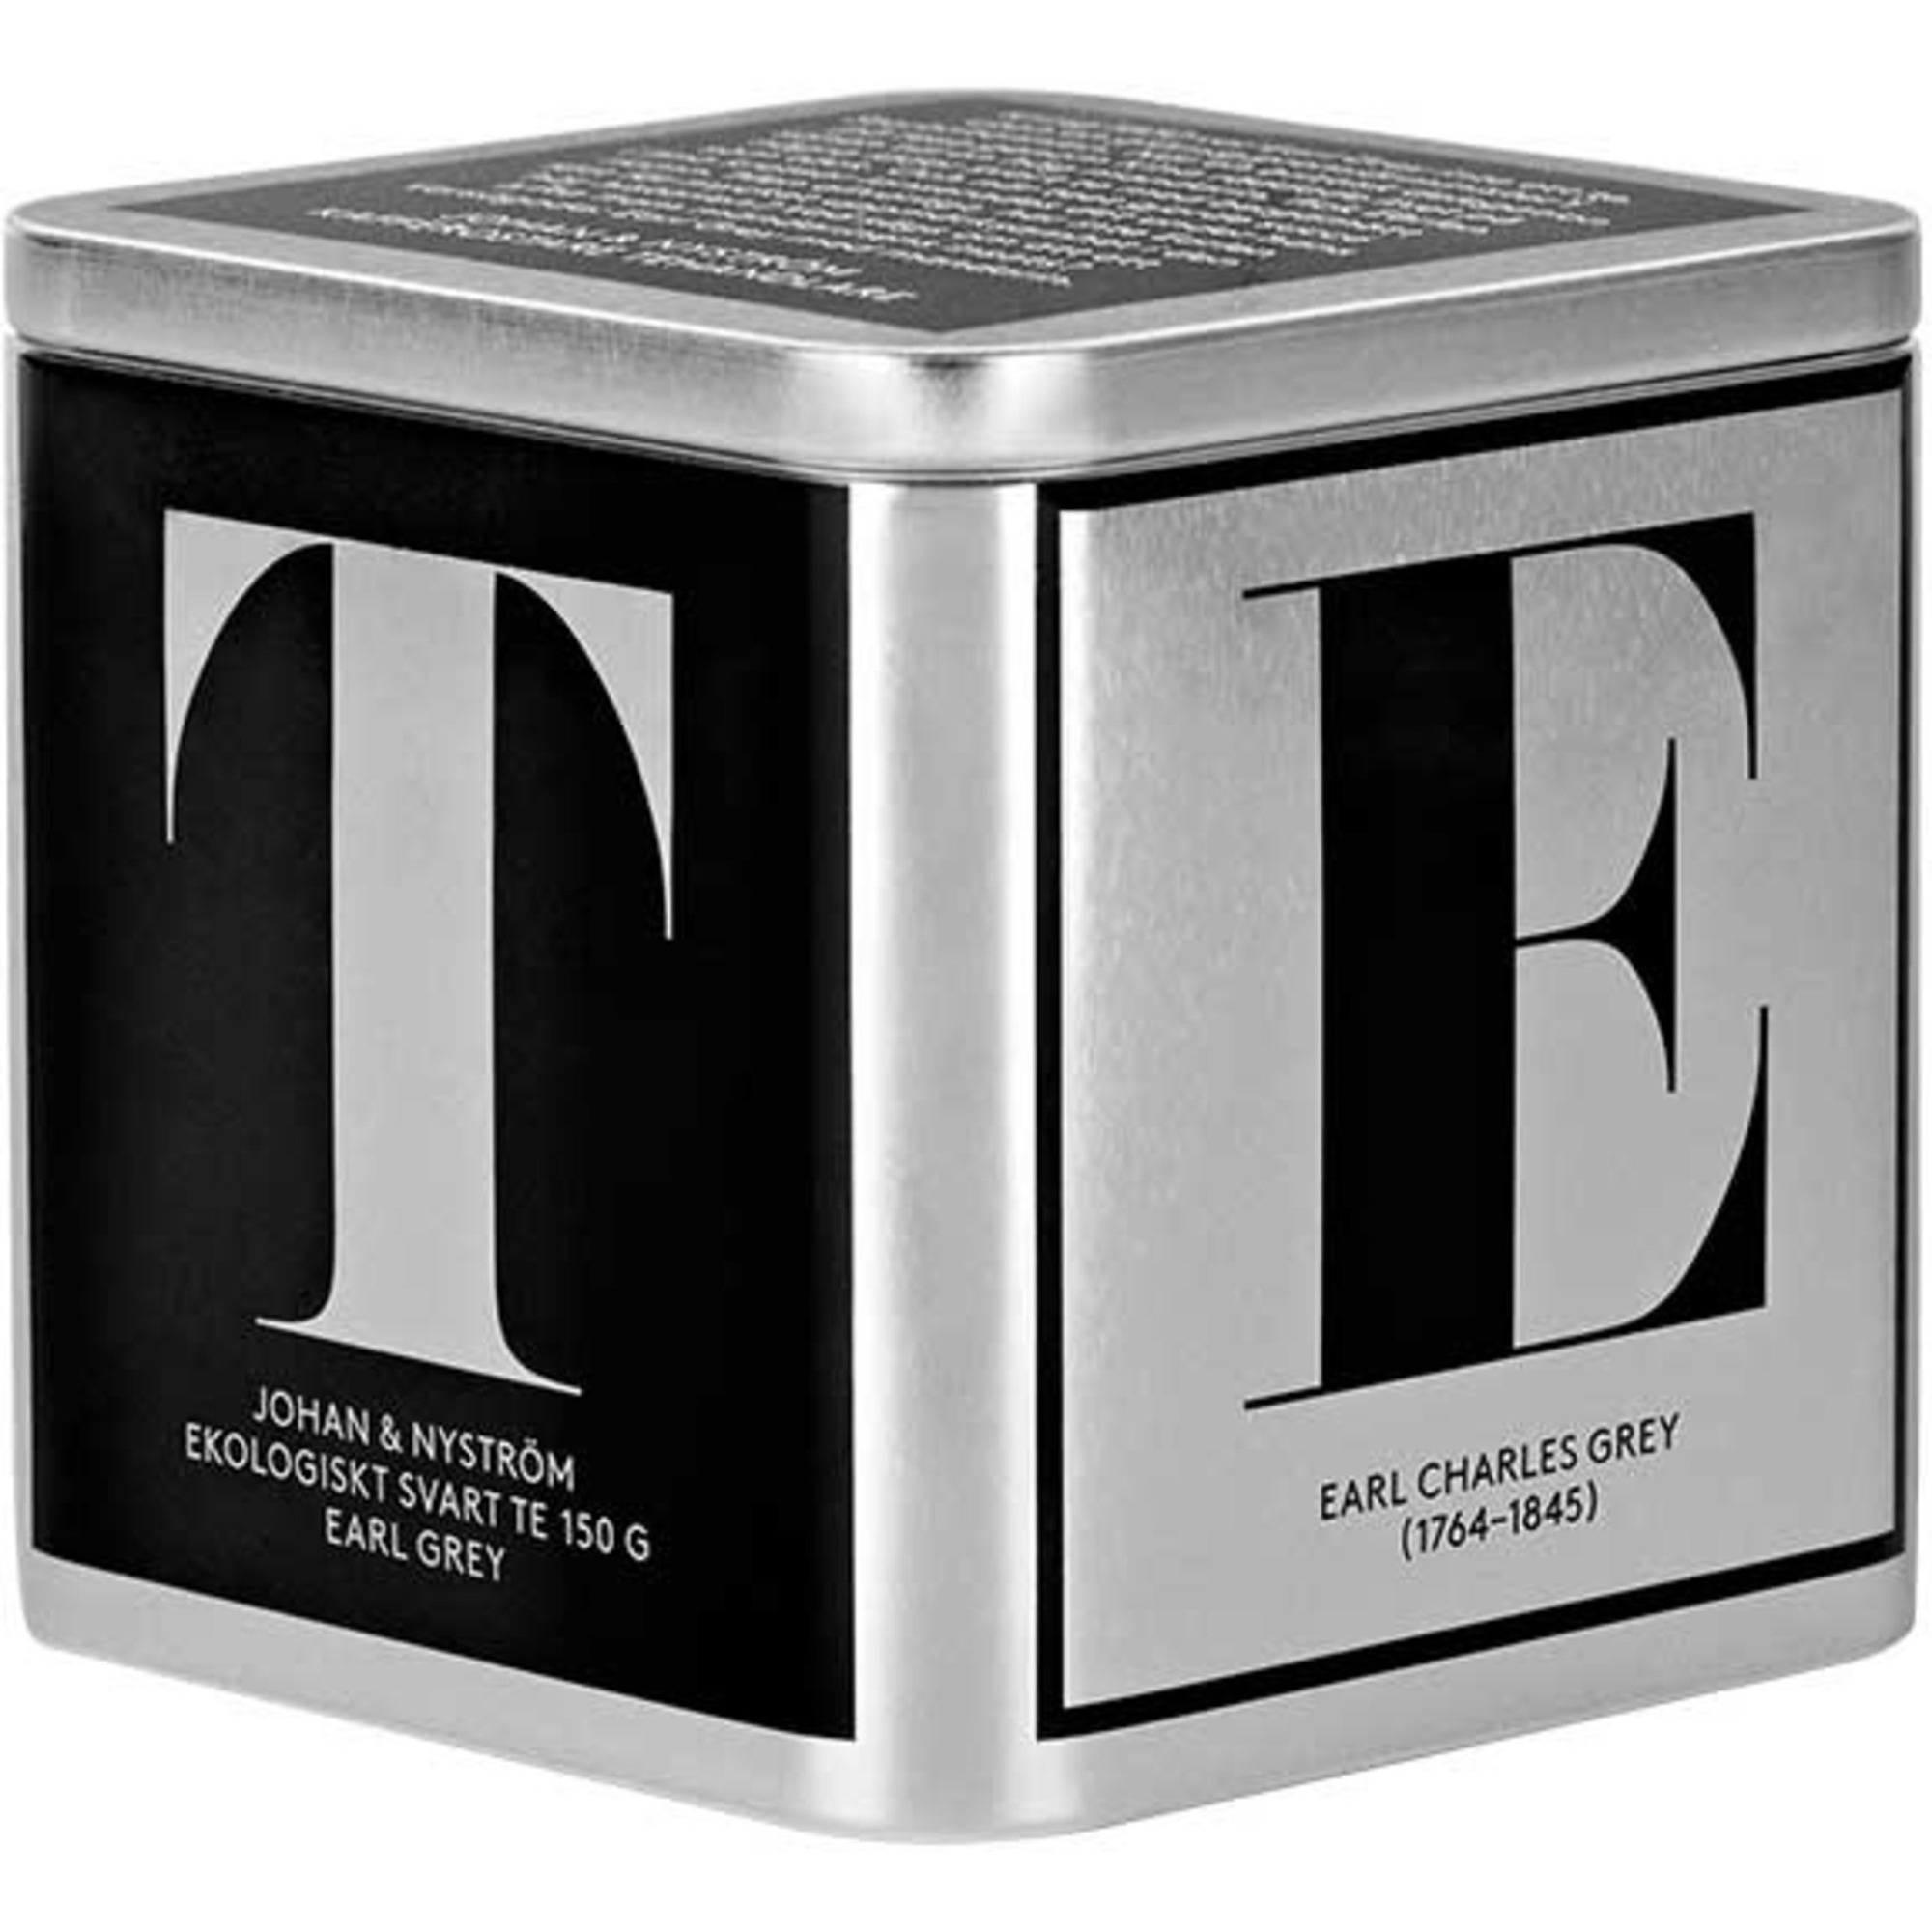 Johan & Nyström T-TE Earl Grey Ekologiskt Svart Te 150g Plåtbox